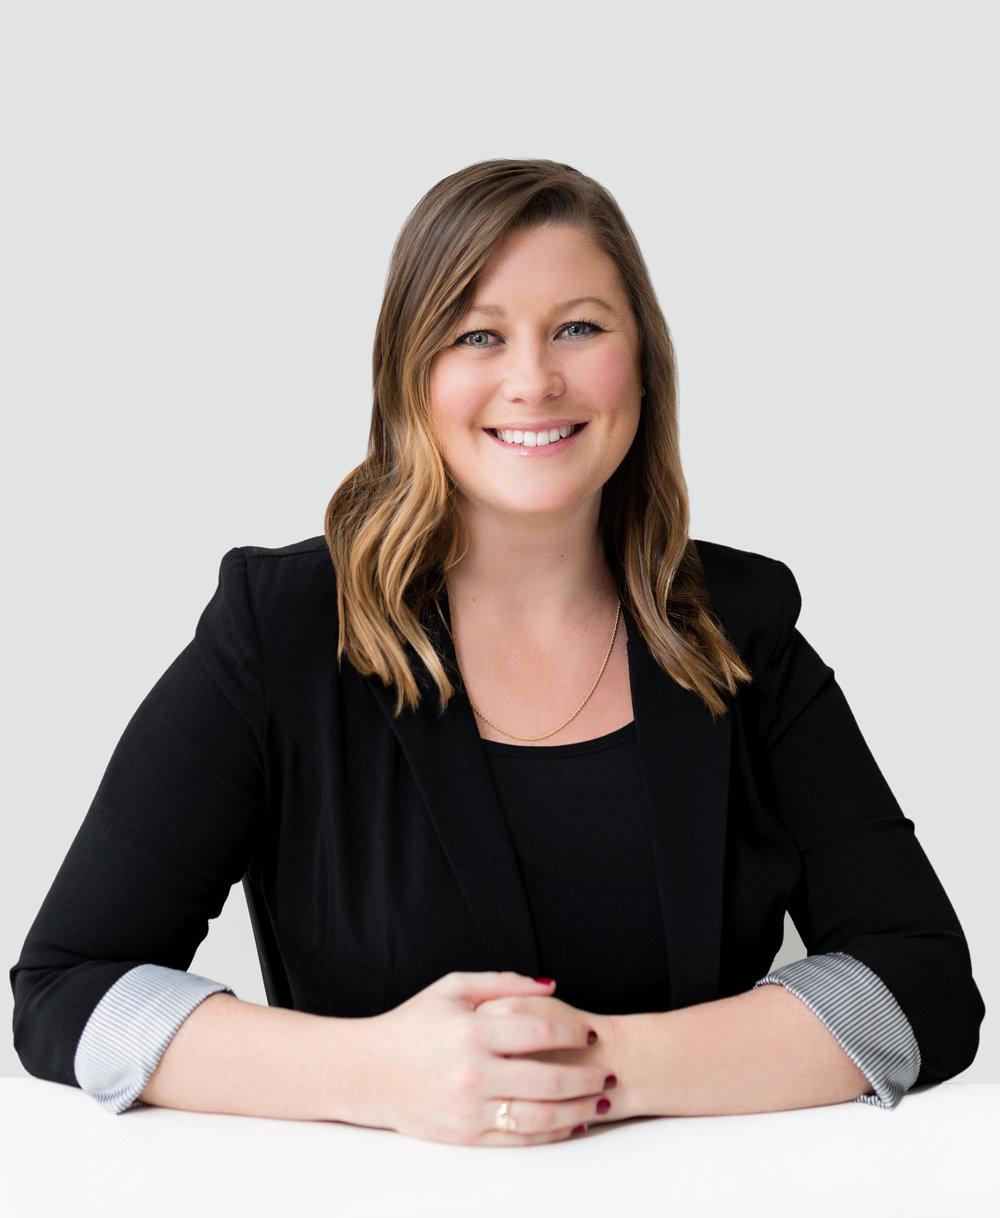 Samantha Price, Principal